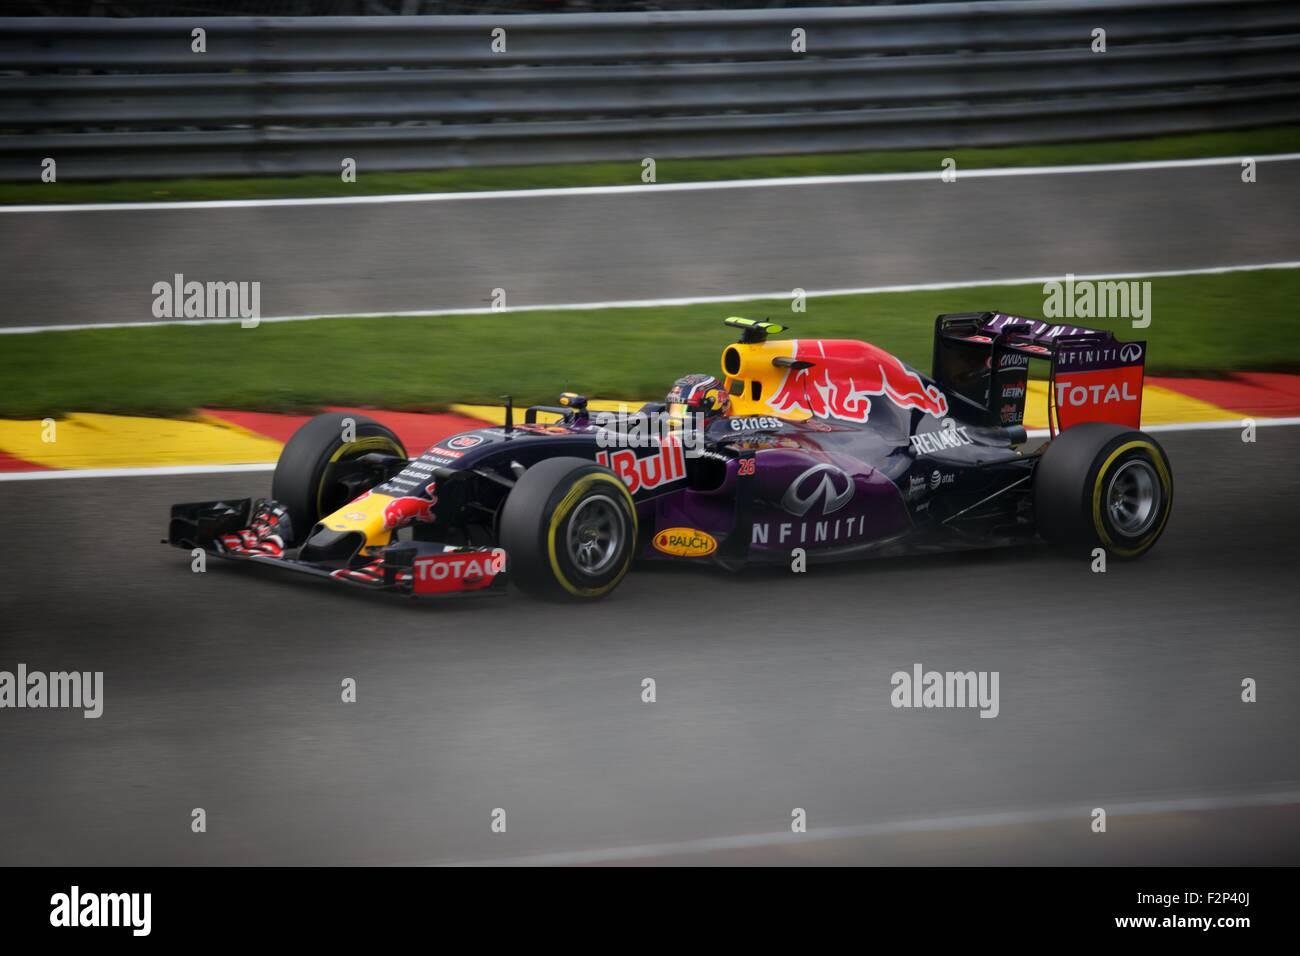 2015 Formel 1 Shell Belgischer Grand Prix Stockfotos 2015 Formel 1